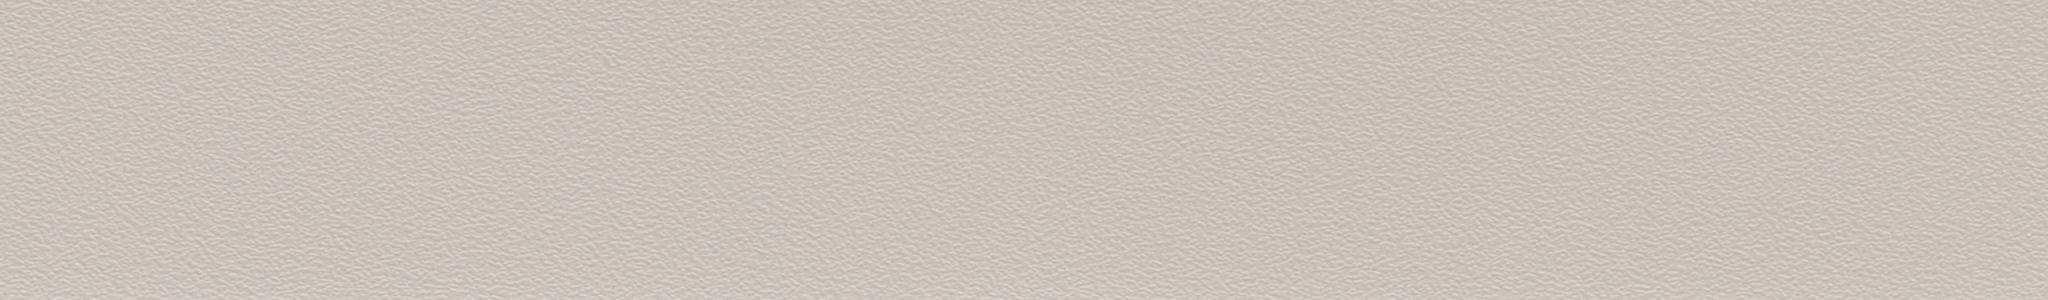 HU 175190 Кромка ABS Серо-бежевый Cuvo - Шагрень XG